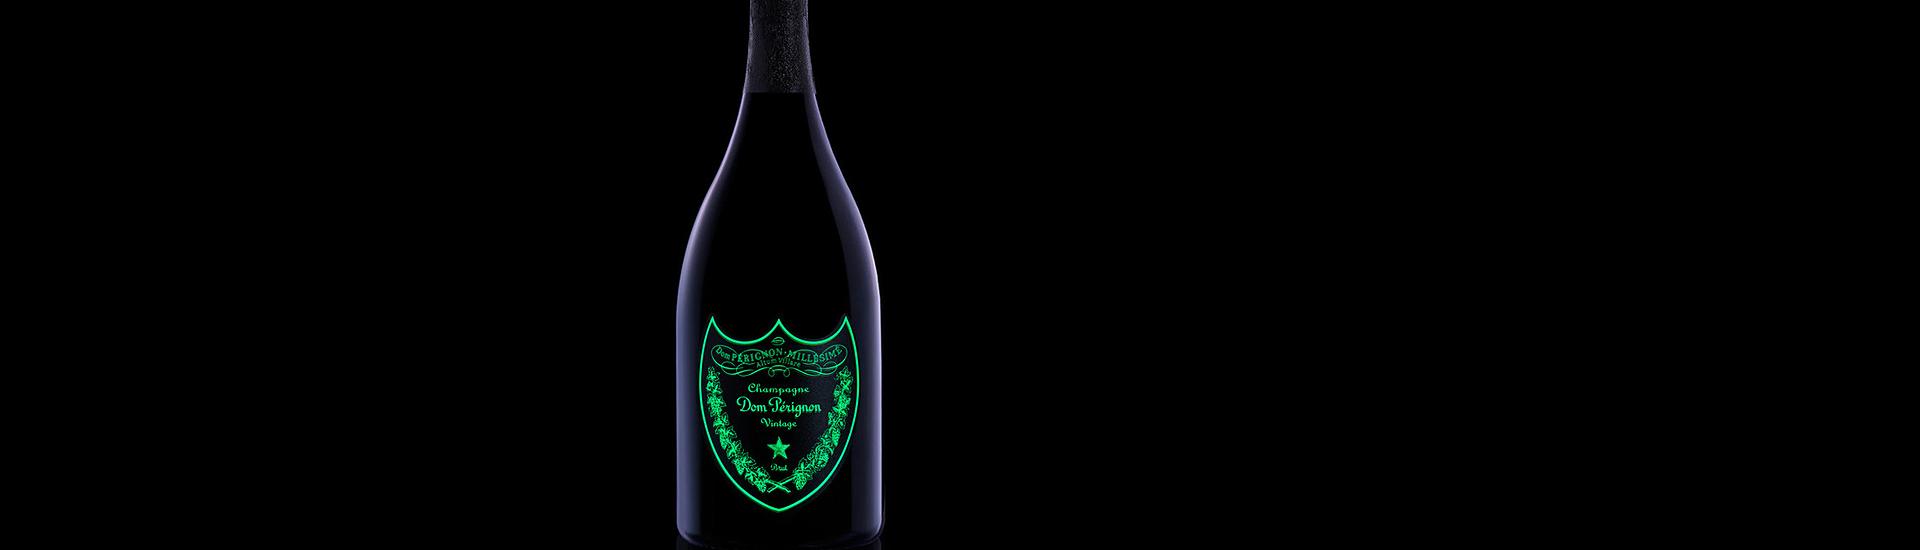 Dom Pérignon Vintage Etiqueta Luminosa 2010